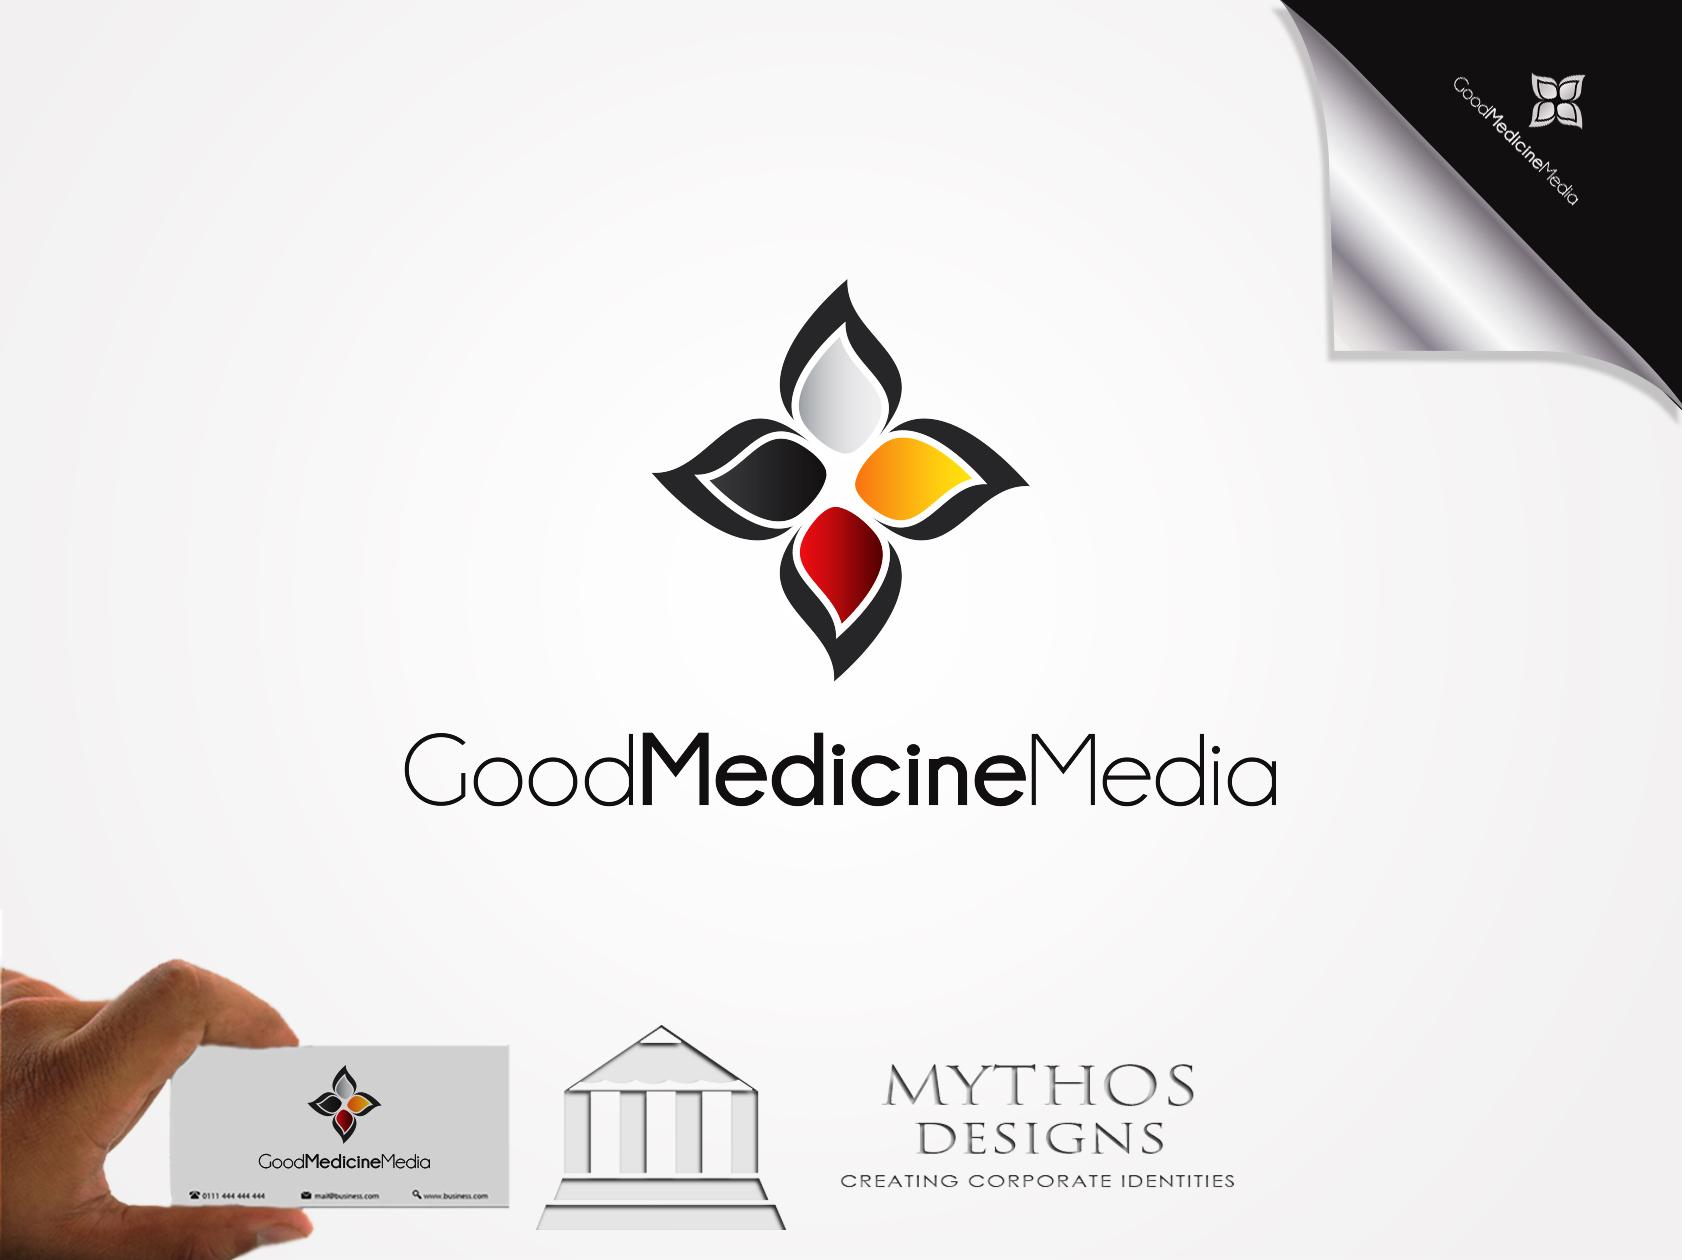 Logo Design by Mythos Designs - Entry No. 238 in the Logo Design Contest Good Medicine Media Logo Design.